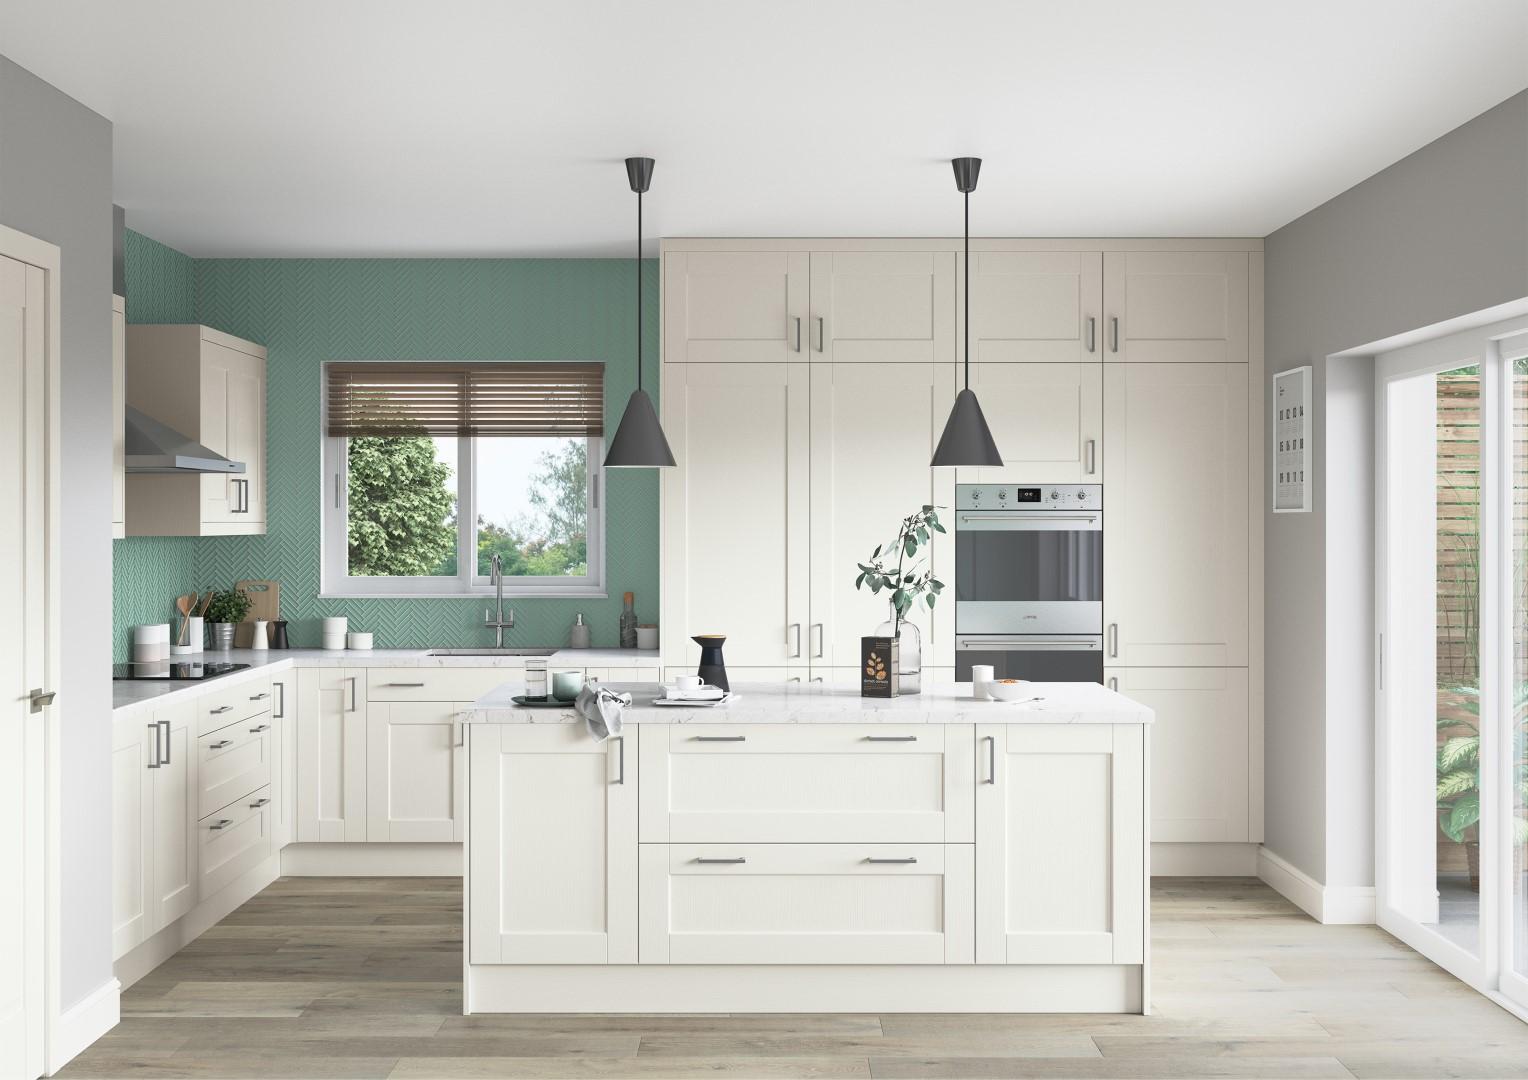 Kensington Porcelain - Kitchen Design - Alan Kelly Kitchens - Waterford - 4